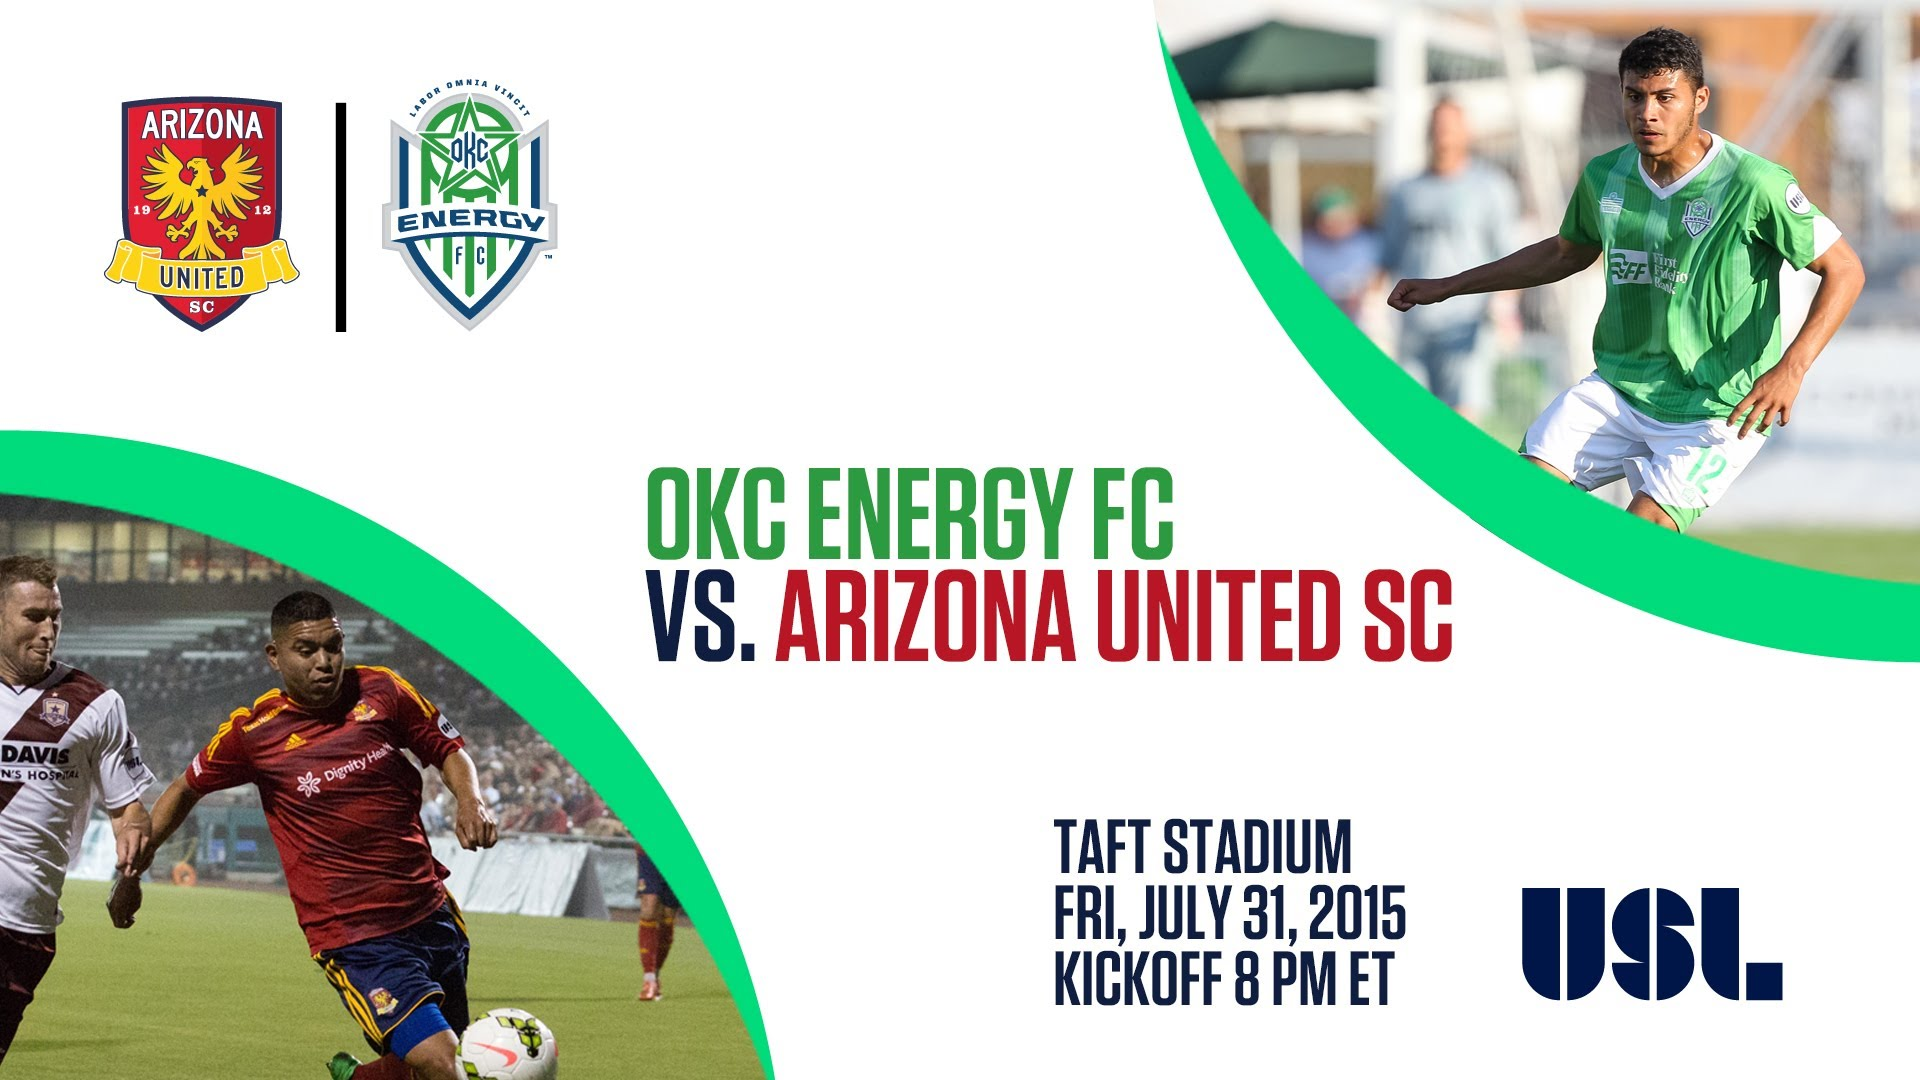 OKC Energy FC vs. Arizona United